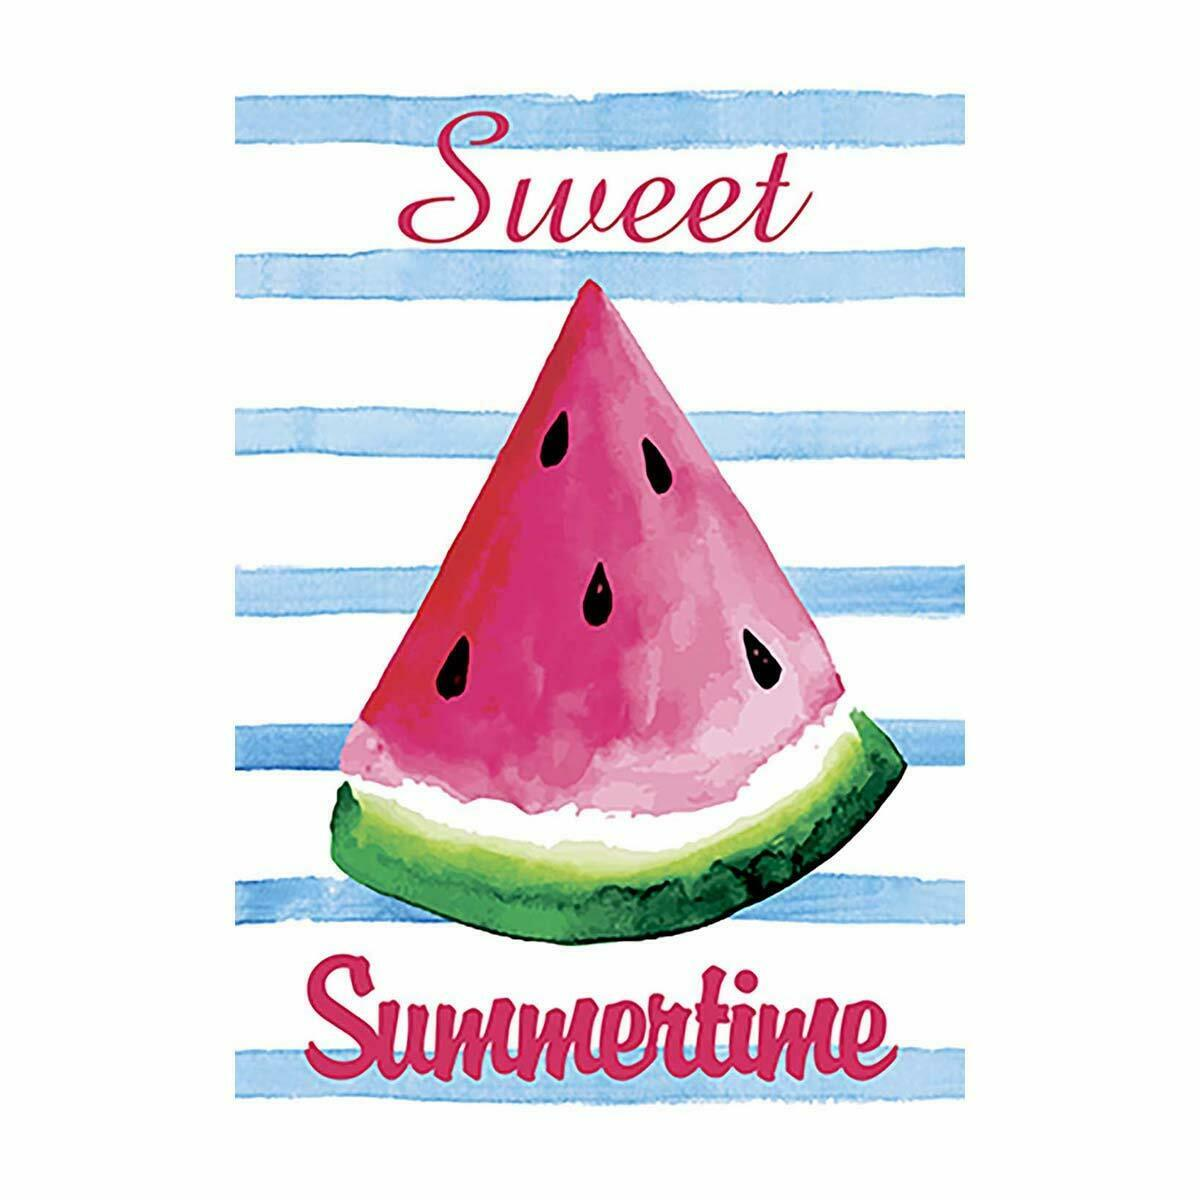 Morigins Sweet Summertime Watermelon Yard Outdoor Decorative